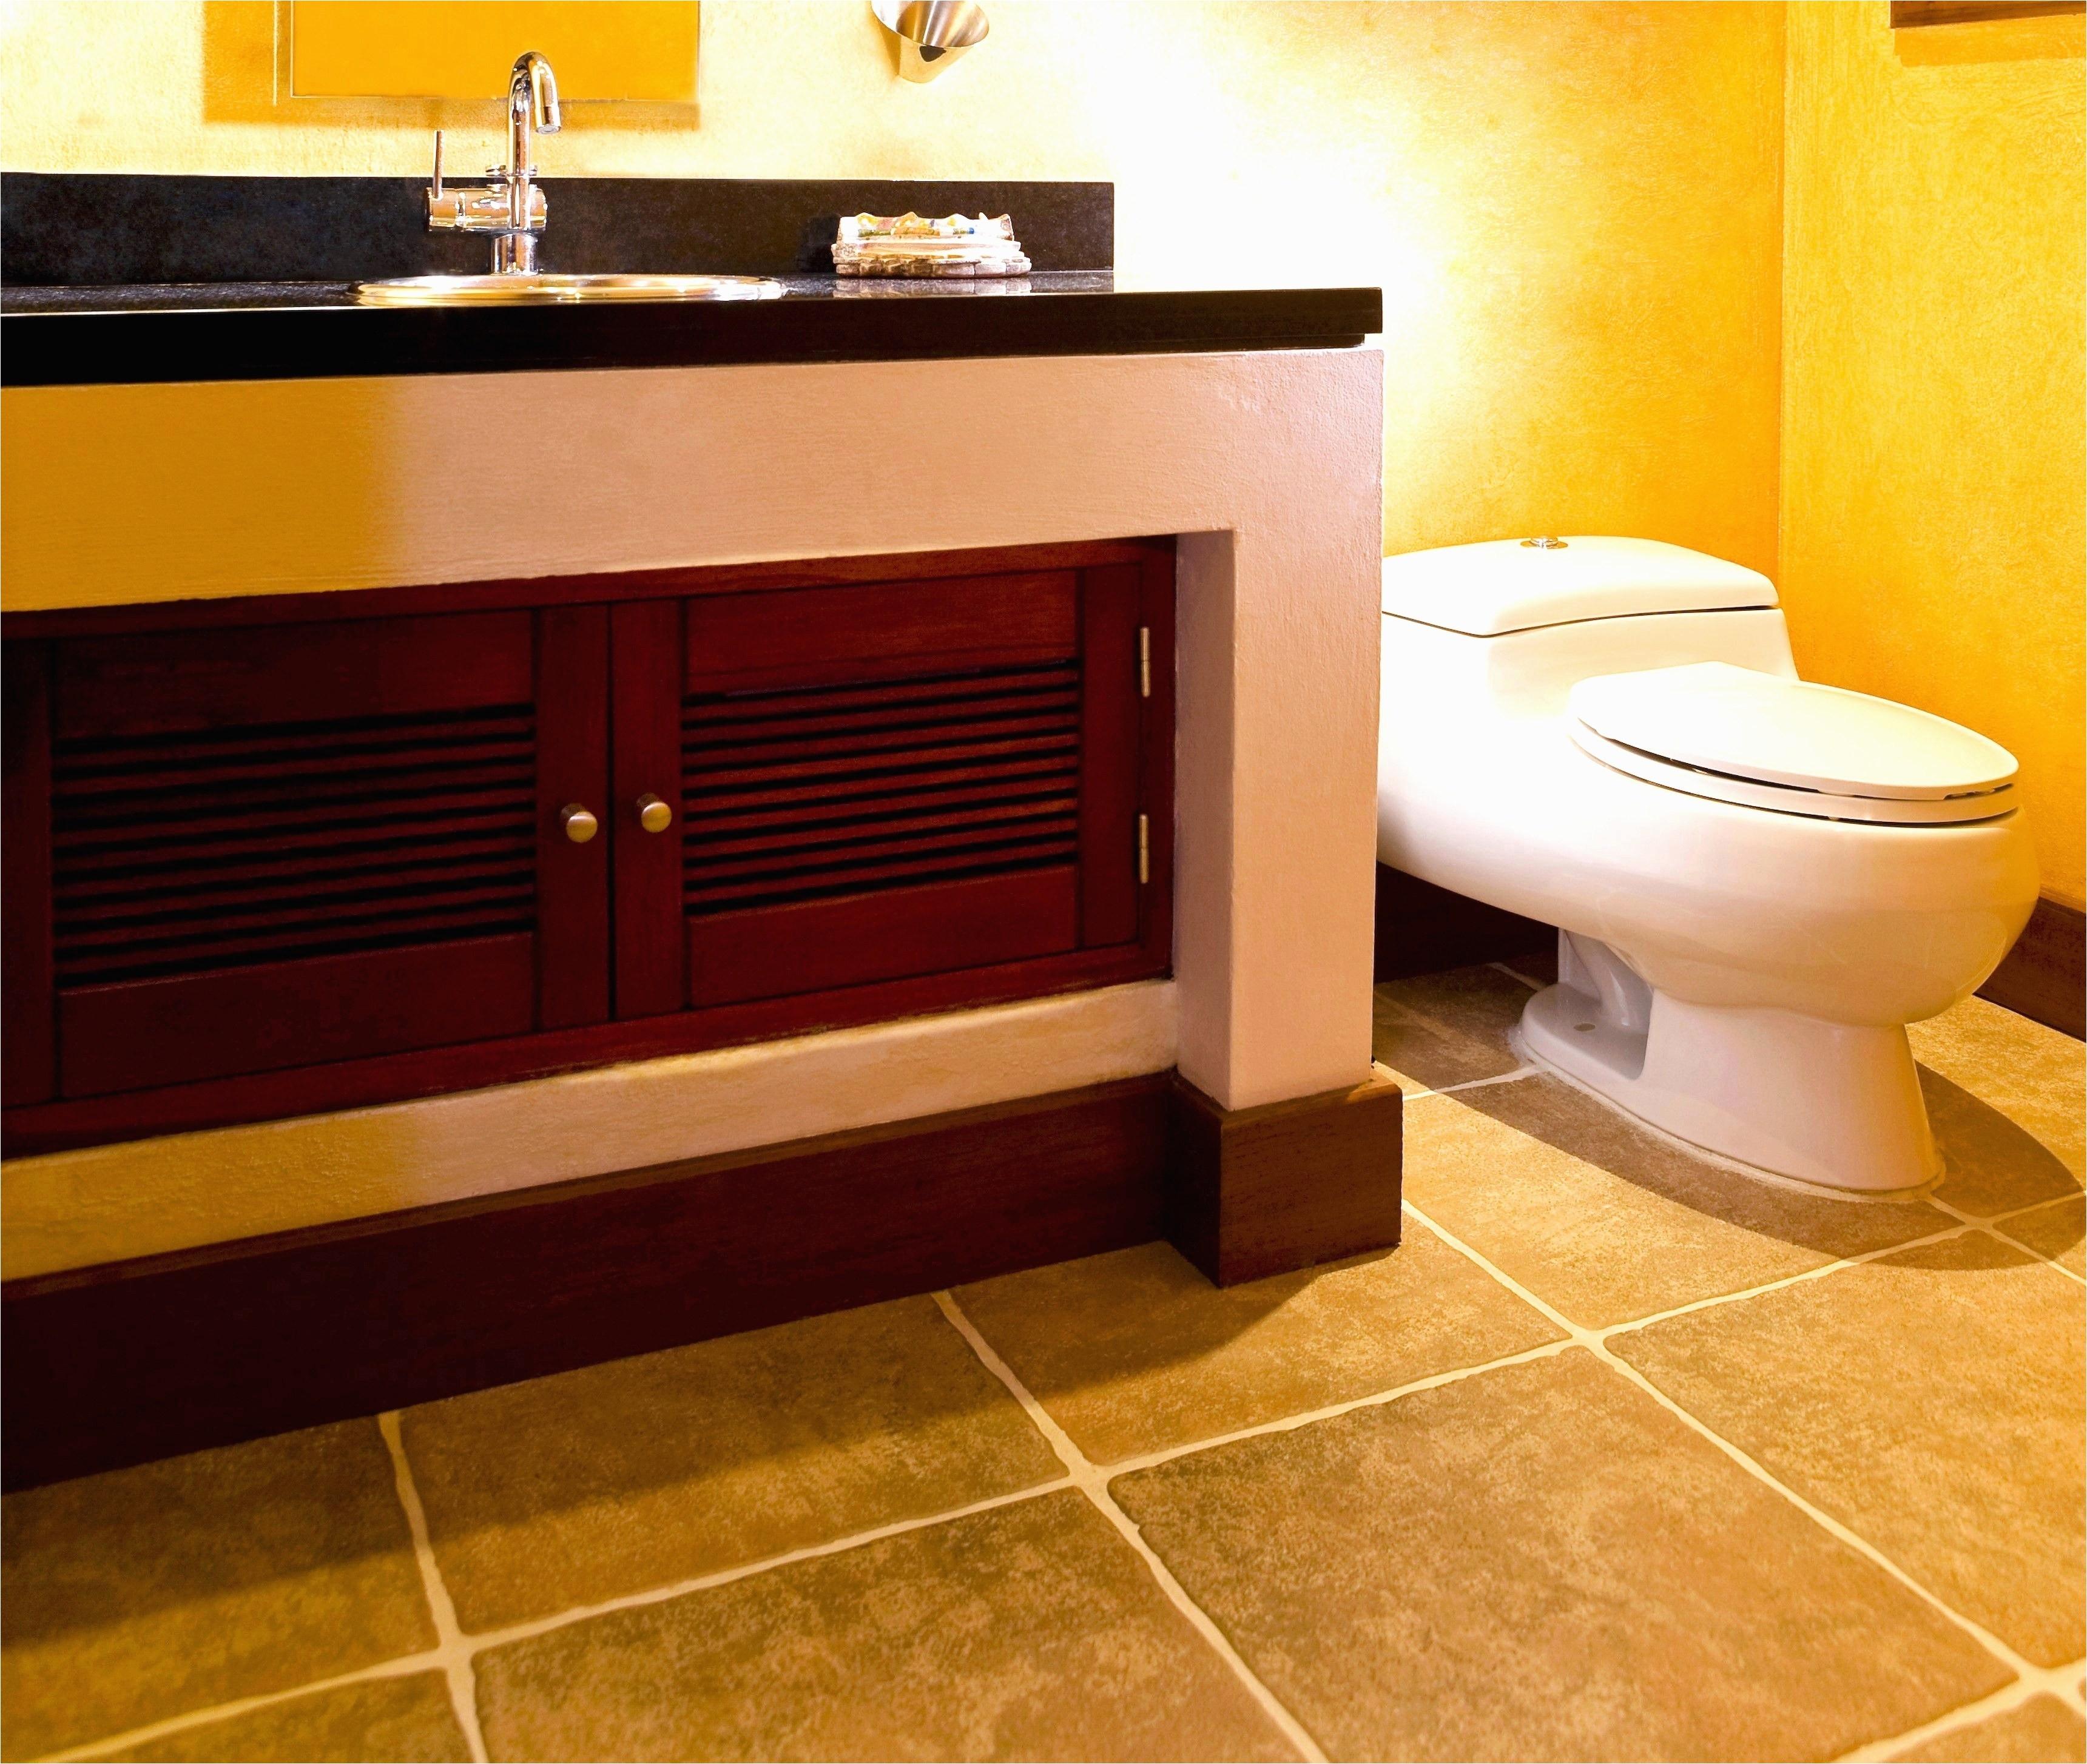 Design Interior Bathroom New Home Decor Tile Best Floor Tiles Mosaic Bathroom 0d New Bathroom